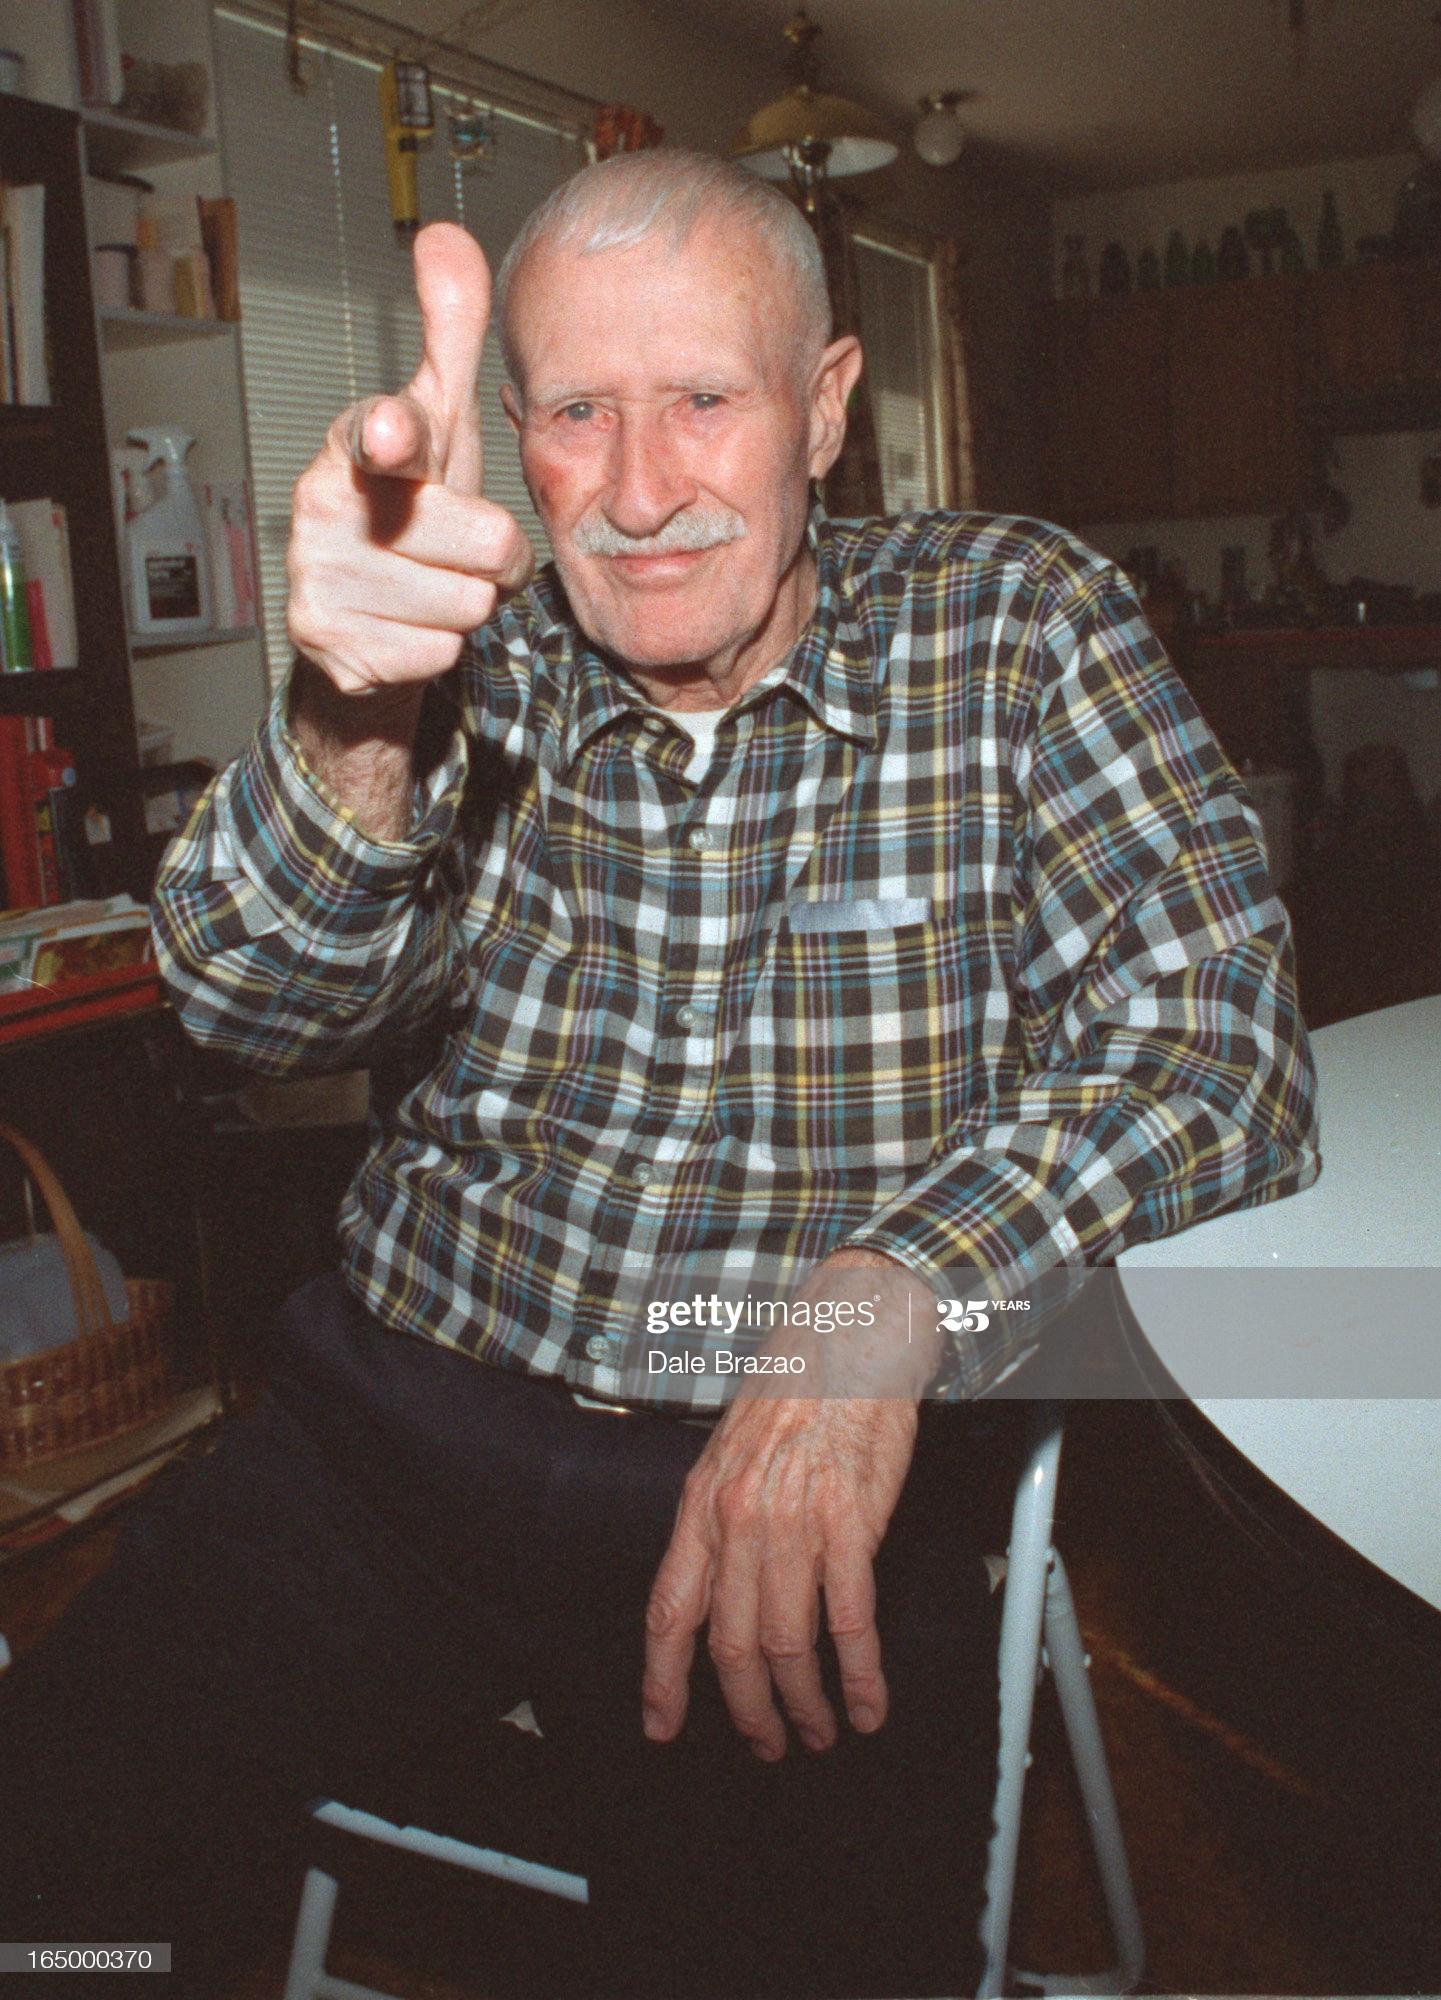 Edwin Alonzo Boyd seen Sept. 27, 1996 in his home in B.C.